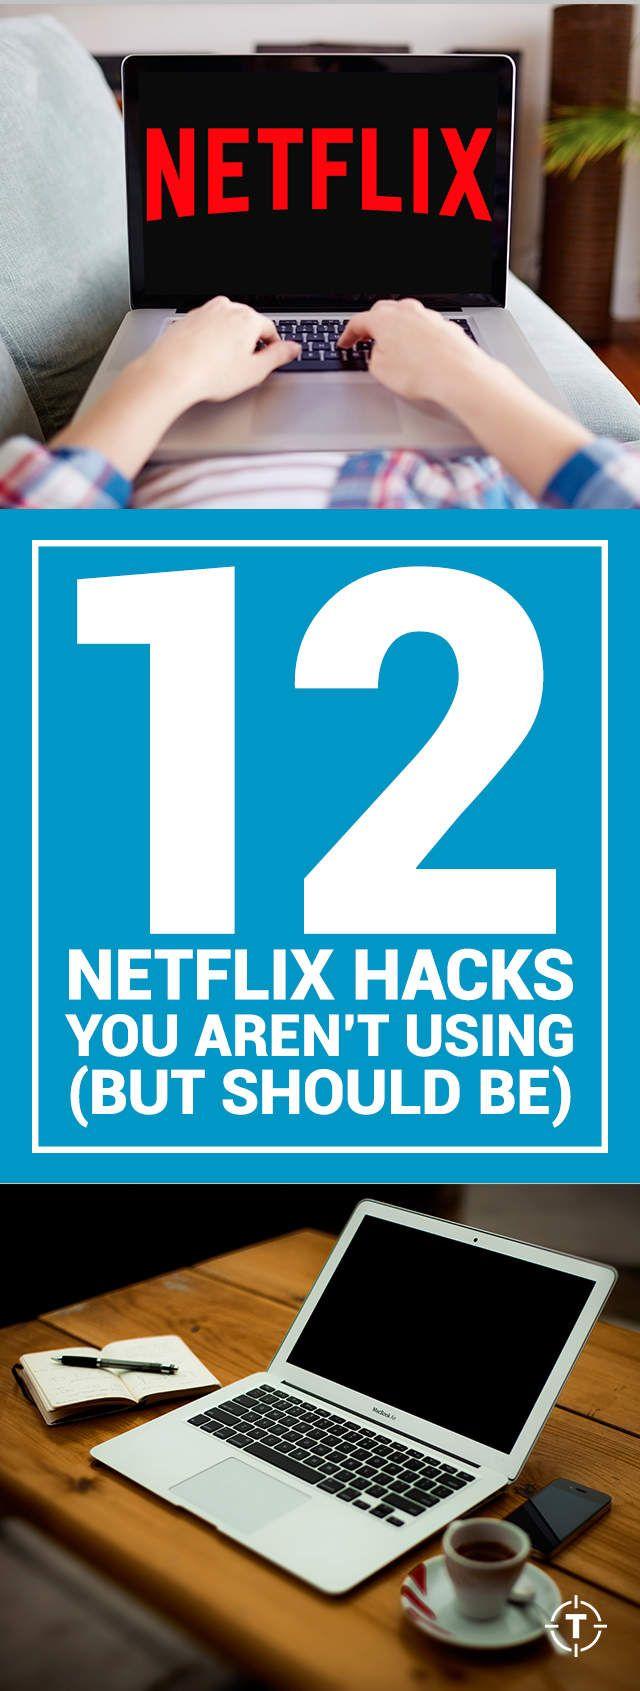 15 Netflix Hacks You Aren't Using (But Should Be) Read